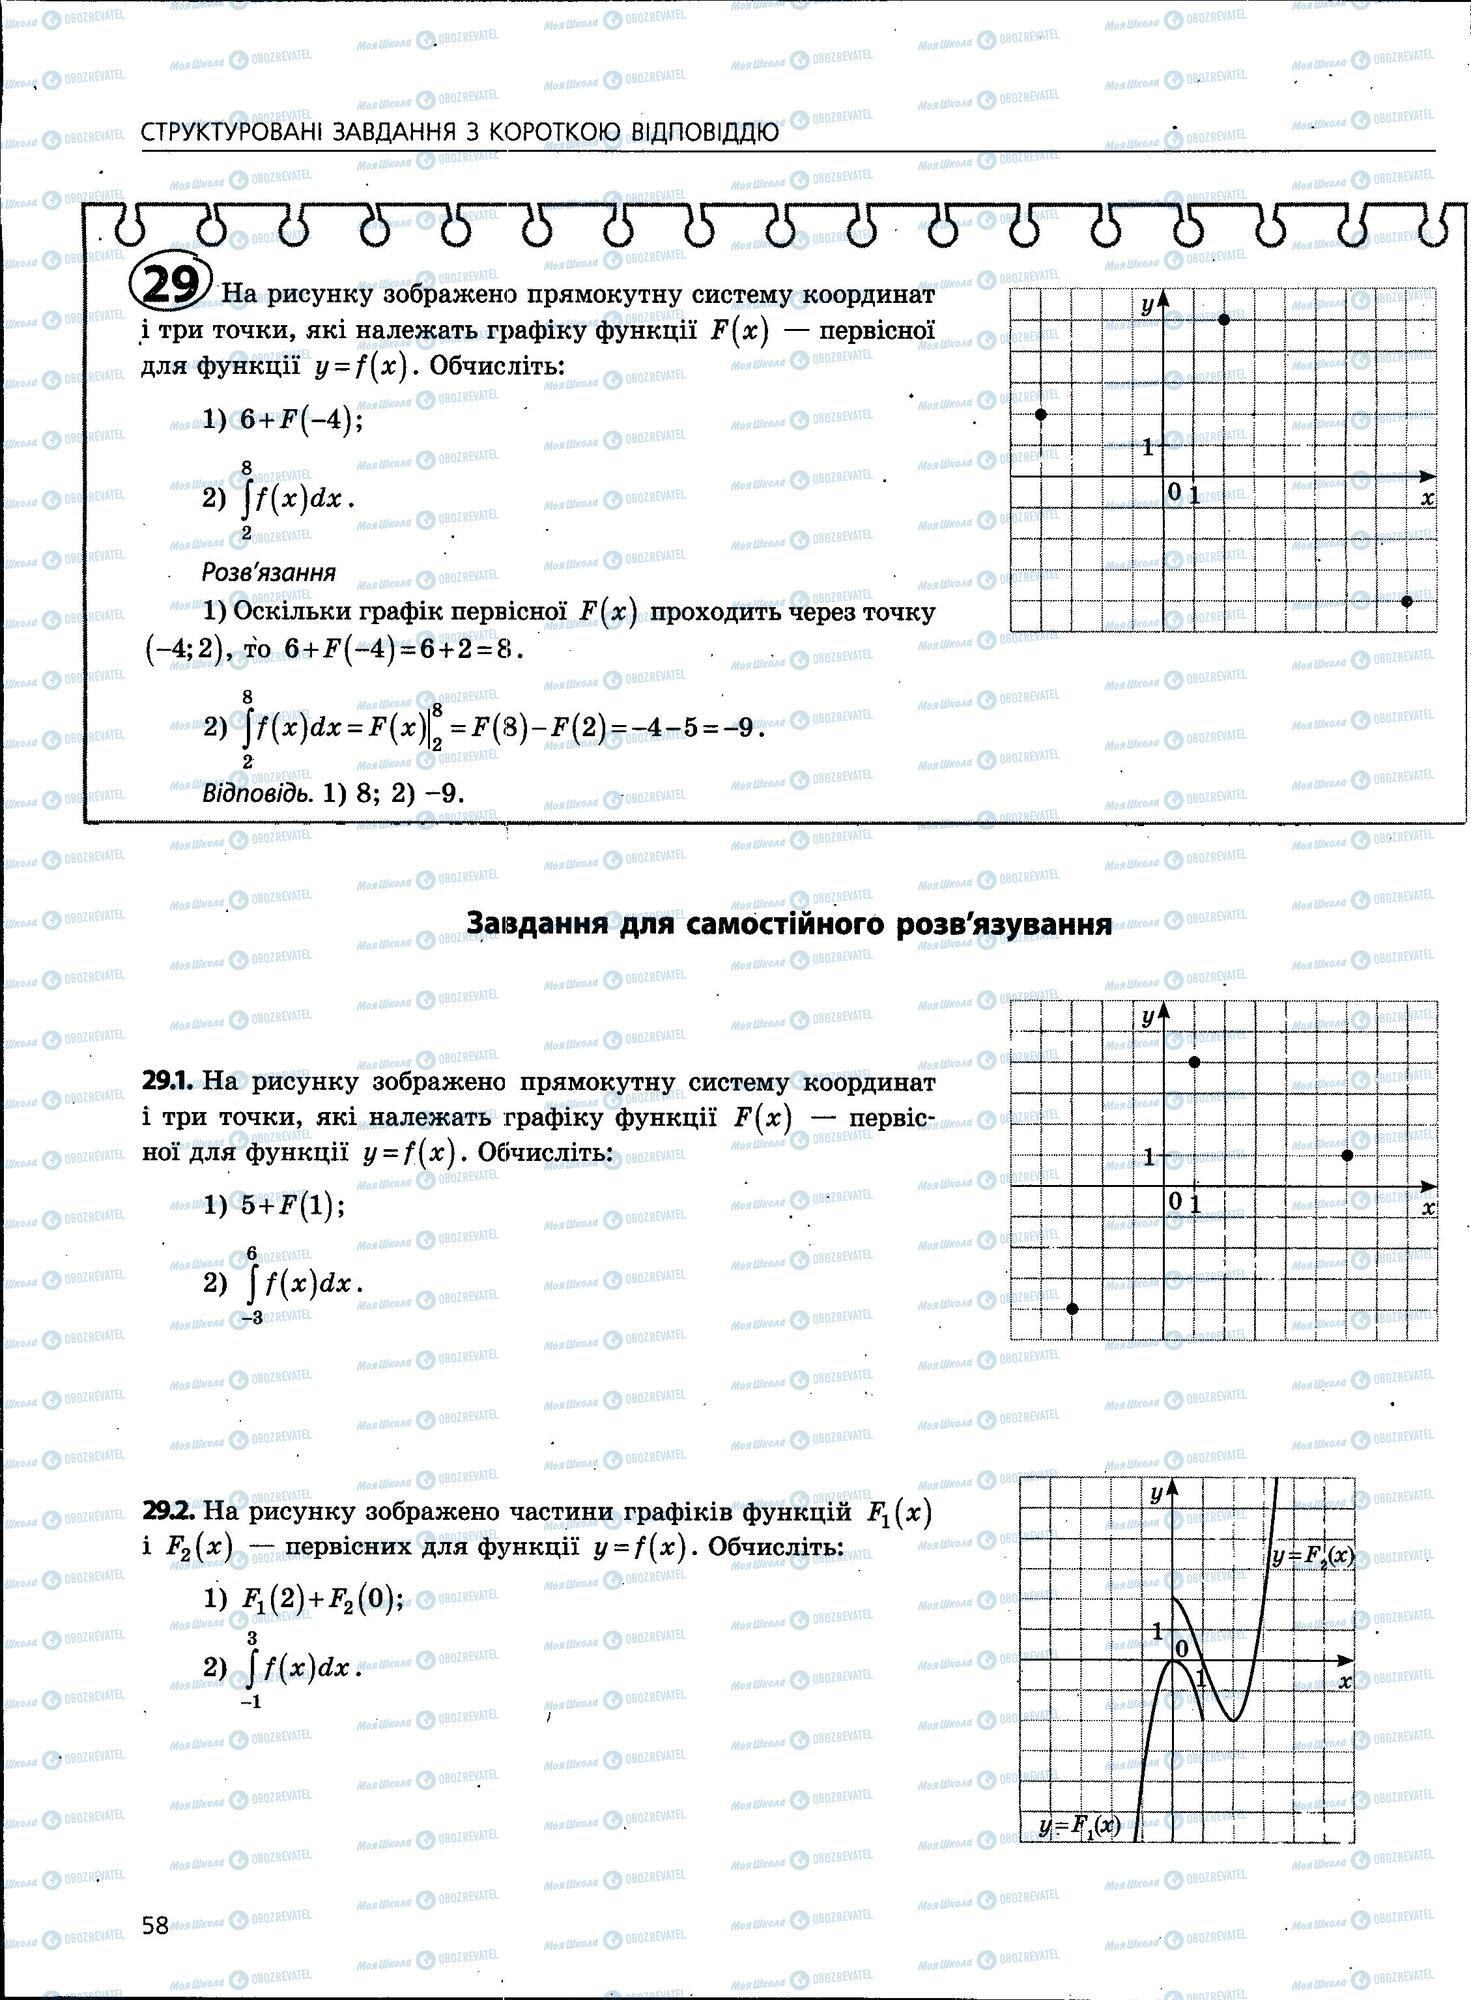 ЗНО Математика 11 класс страница 58